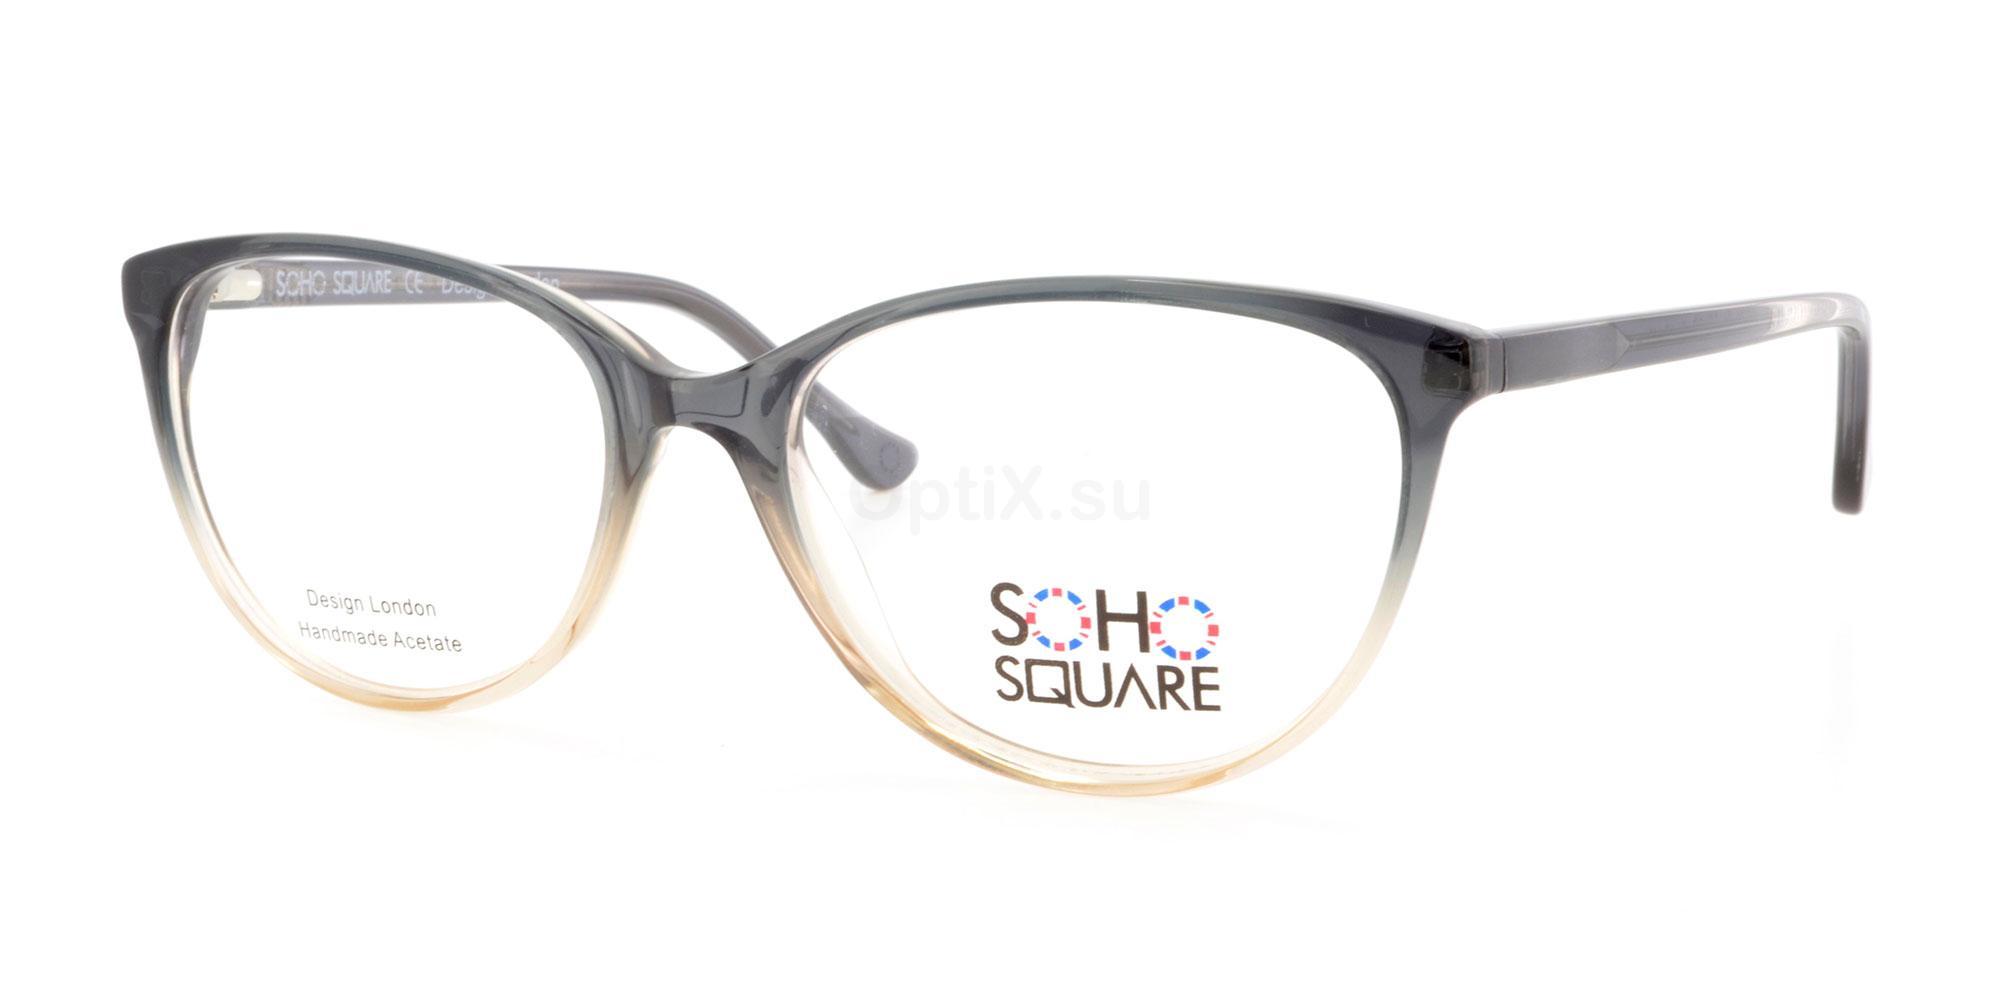 C1 SS 028 Glasses, Soho Square